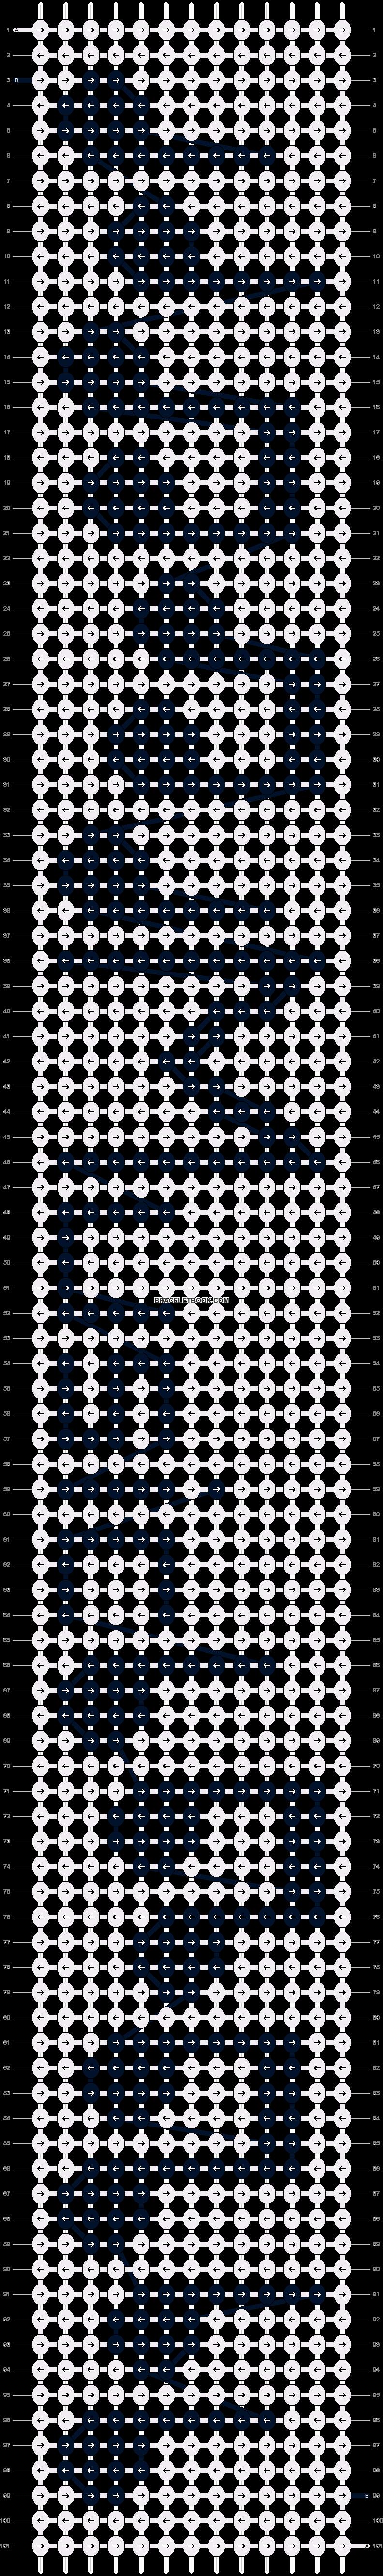 Alpha Pattern #22595 added by kcain1